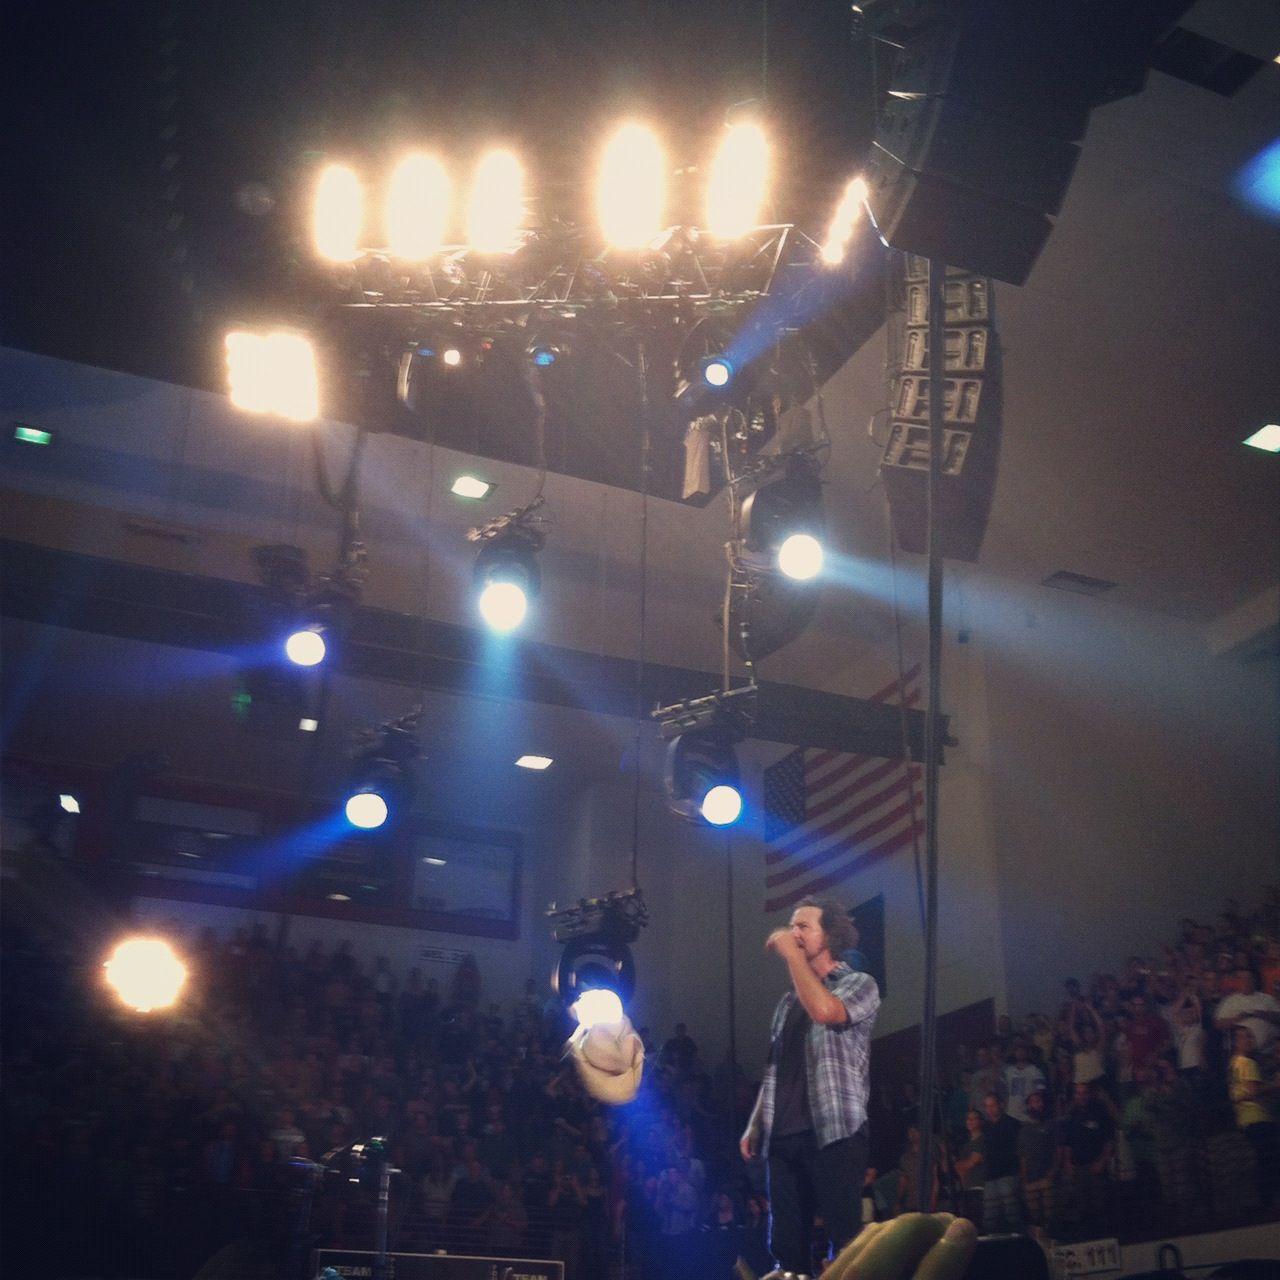 Eddie Vedder (Pearl Jam) - Adams Center, Missoula